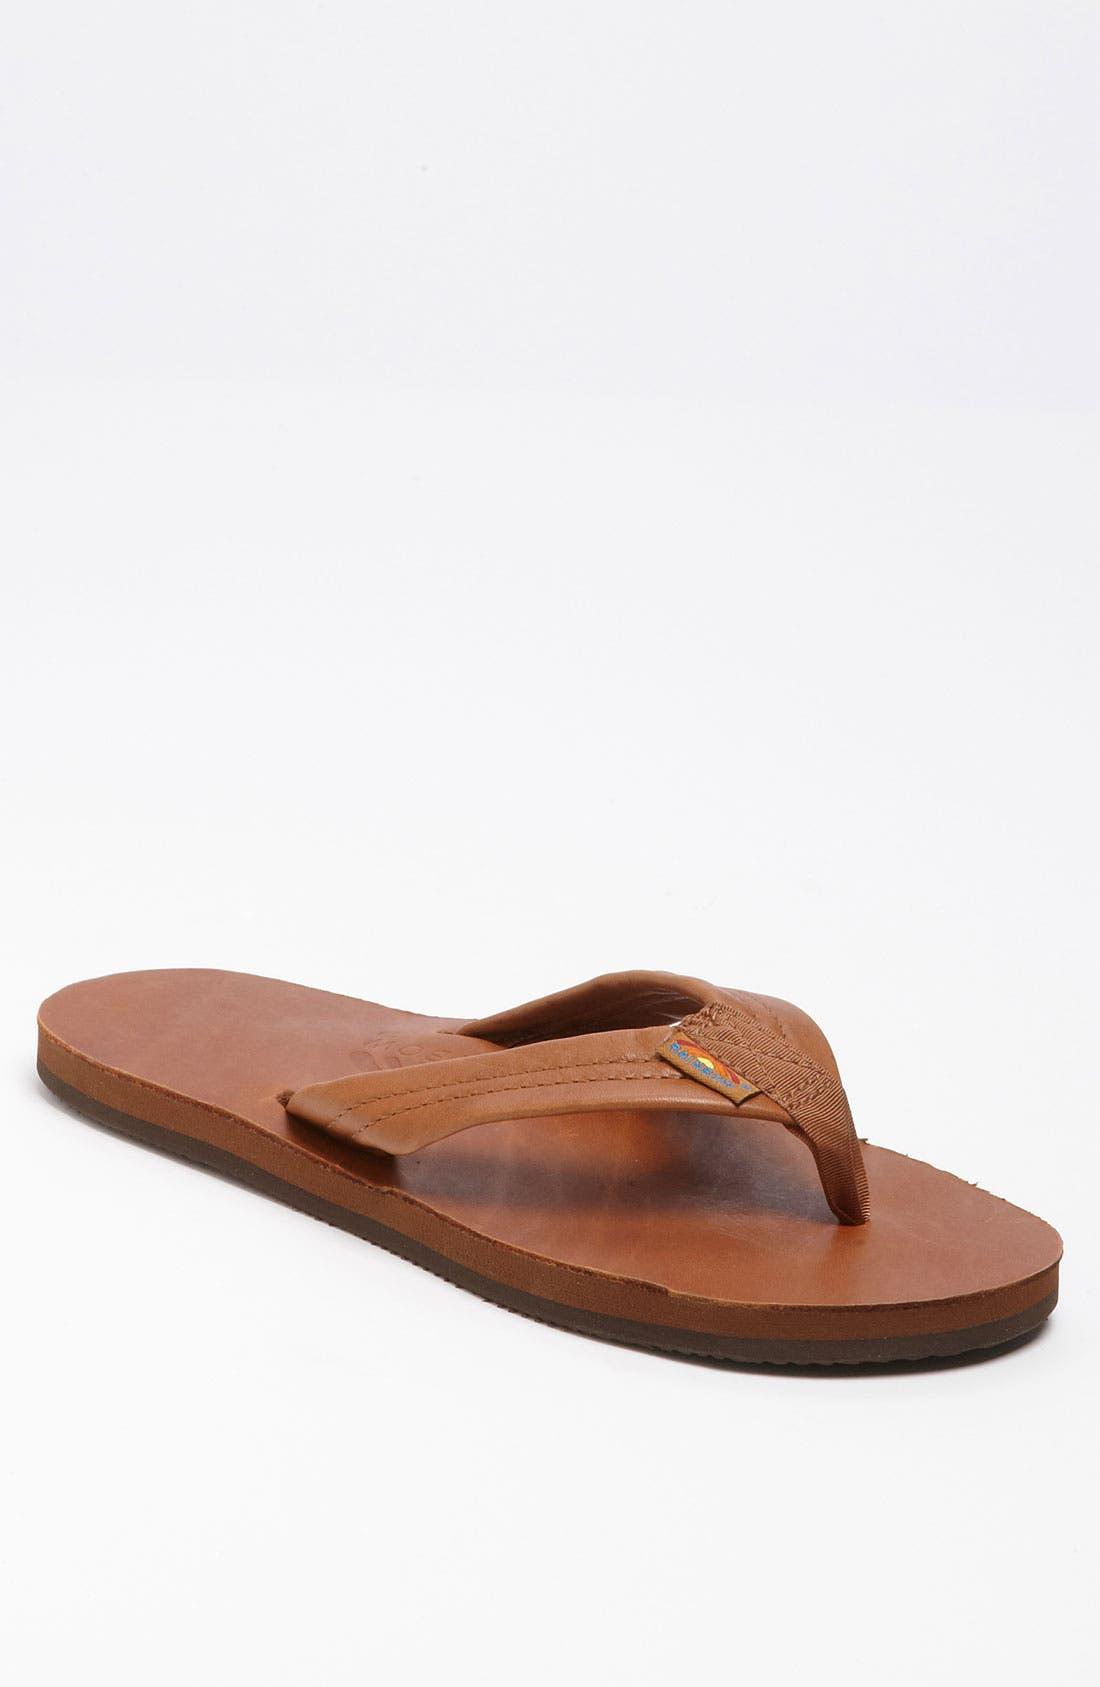 80a52a597bc6 Rainbow Sandals   Flip-Flops